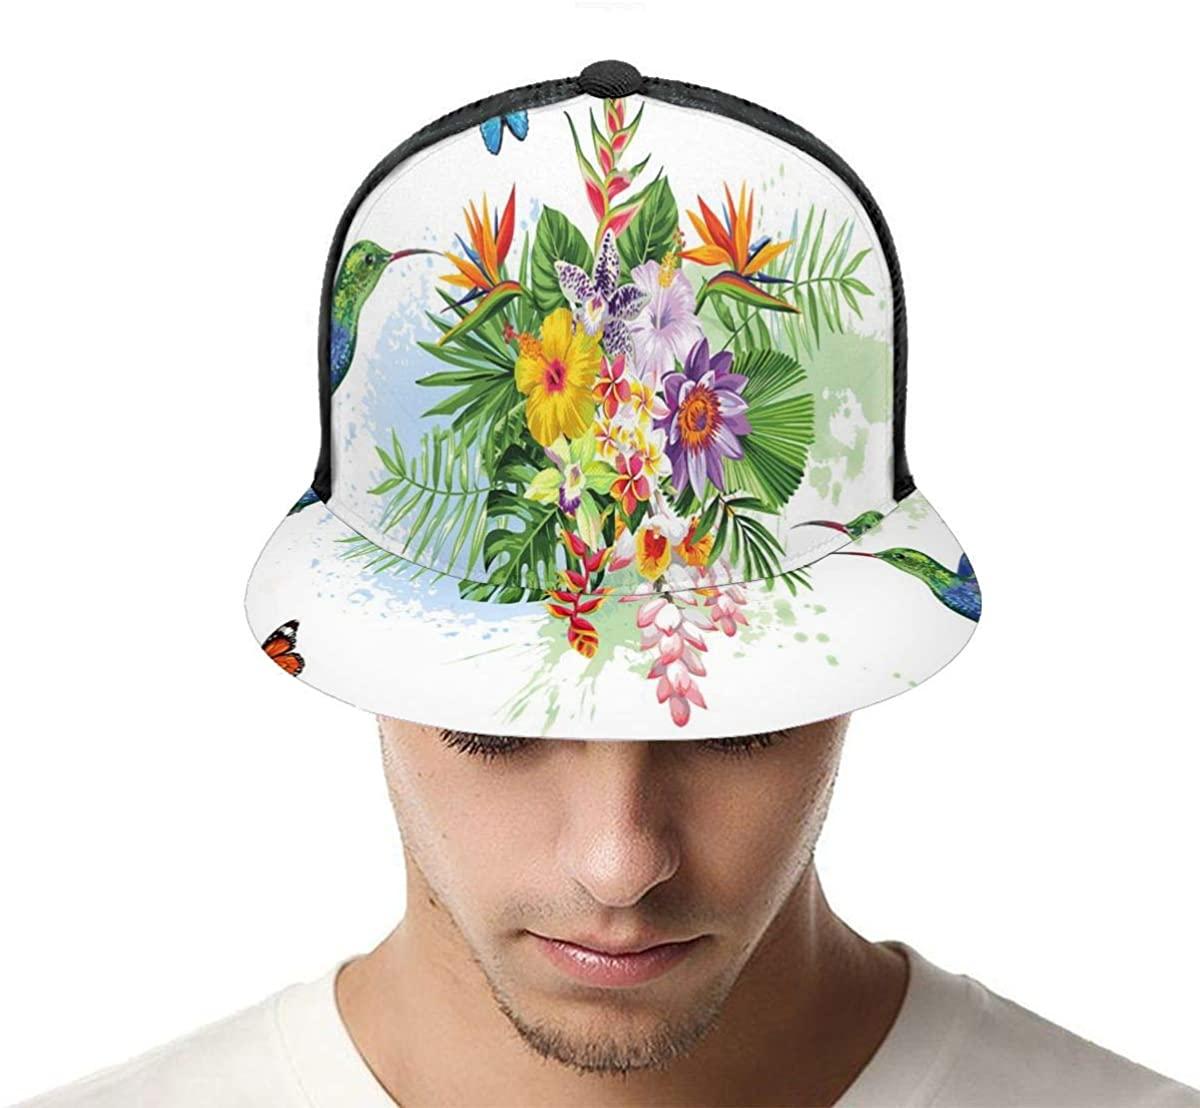 EJudge Mesh Back Trucker Hats Burgundy Color Butterflies Adjustable Baseball Cap Flat Brim Summer